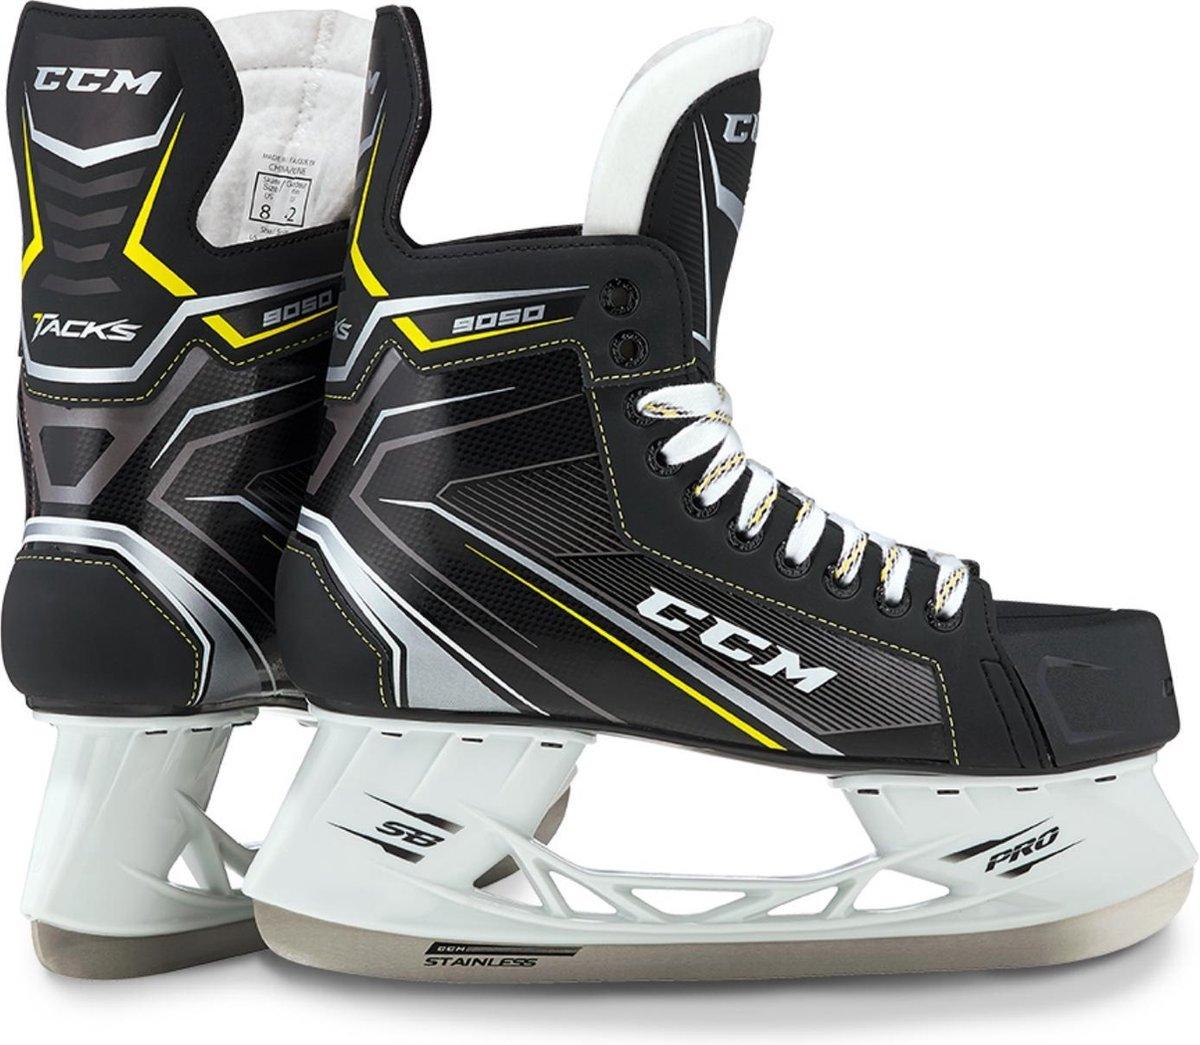 CCM IJshockeyschaatsen TACKS 9050 JR Zwart 38